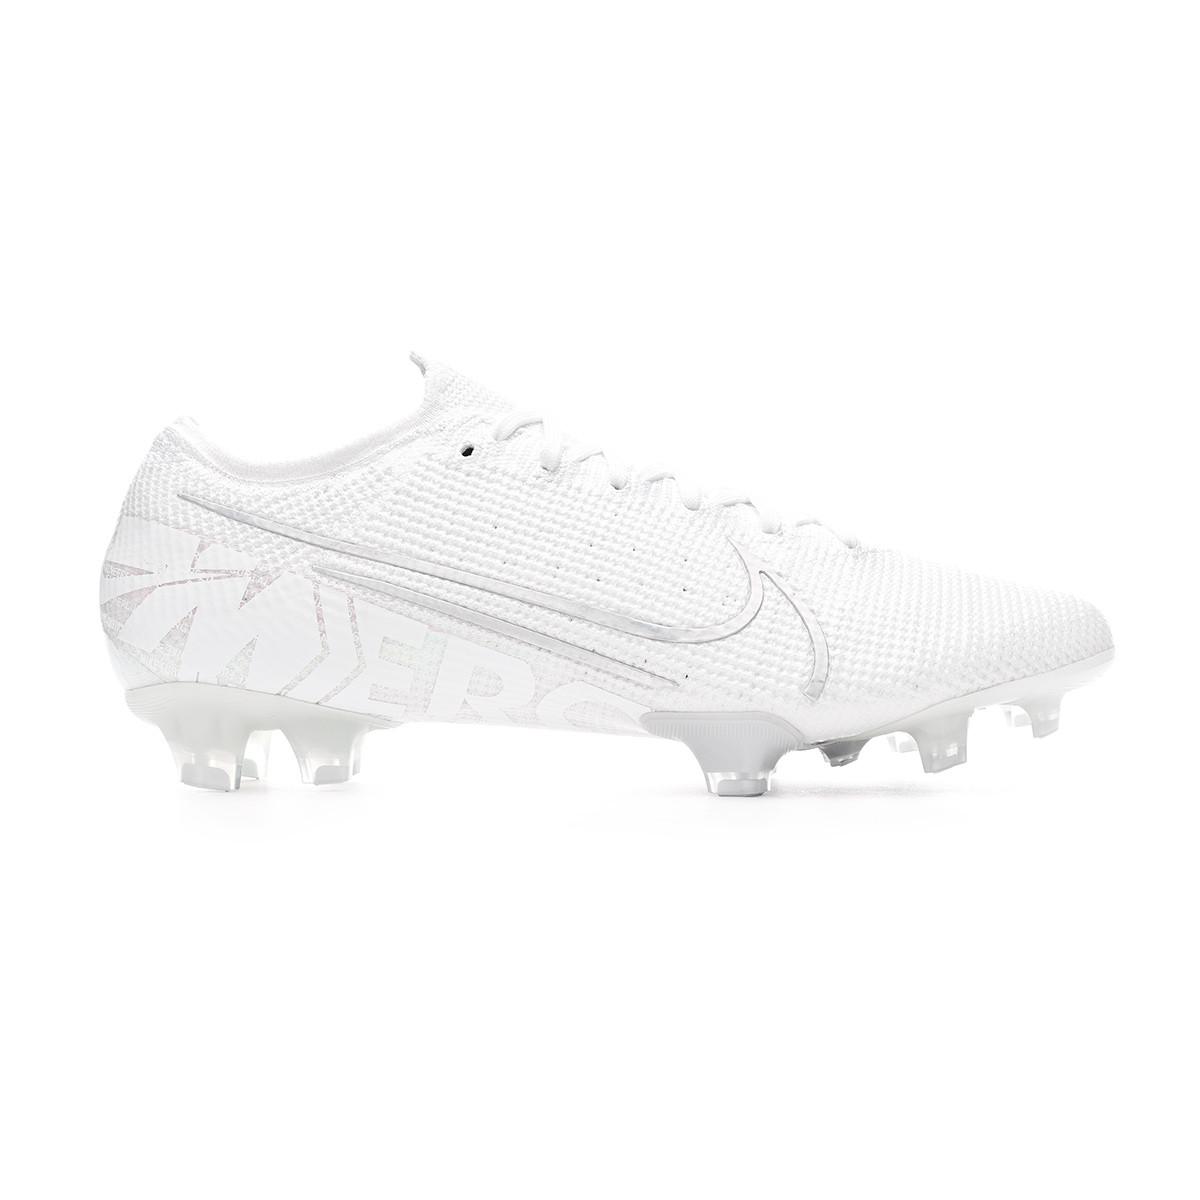 buy popular cute cheap offer discounts Nike Mercurial Vapor XIII Elite FG Football Boots